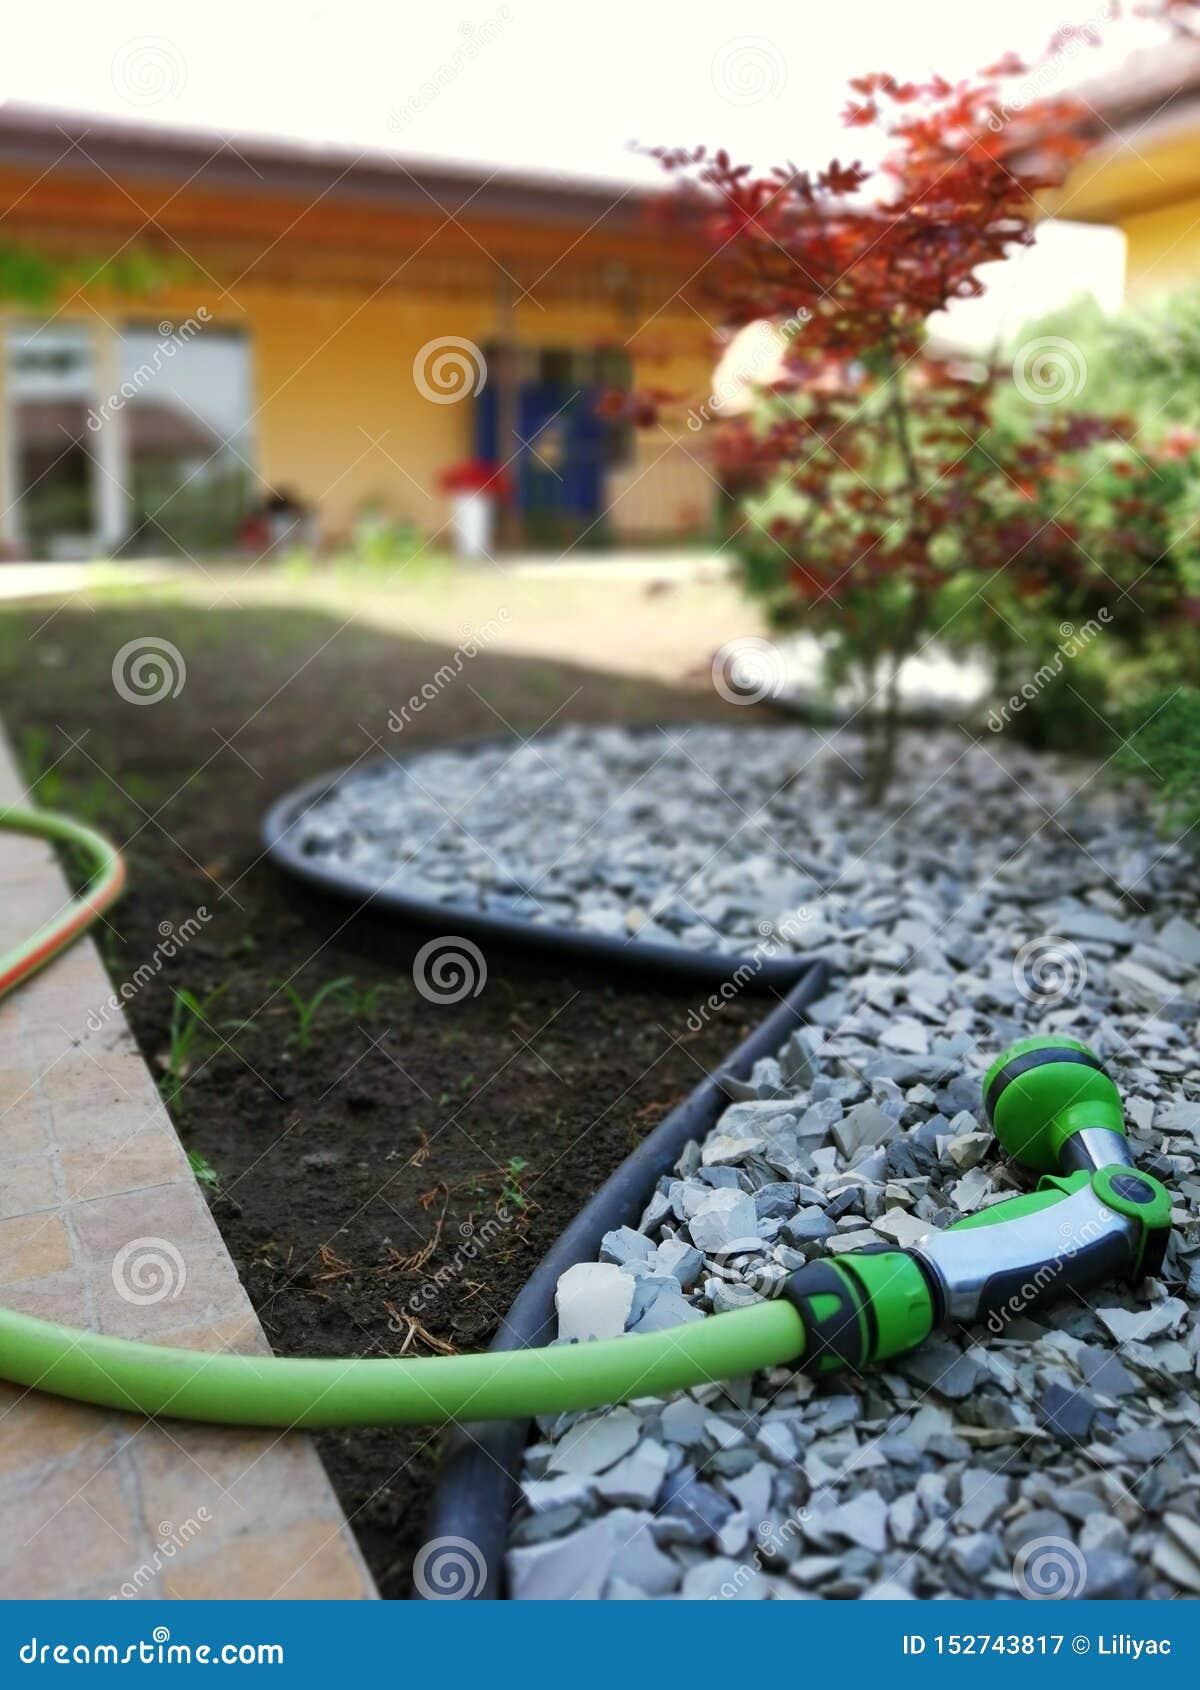 Tuinhulpmiddel om water te geven en zorg